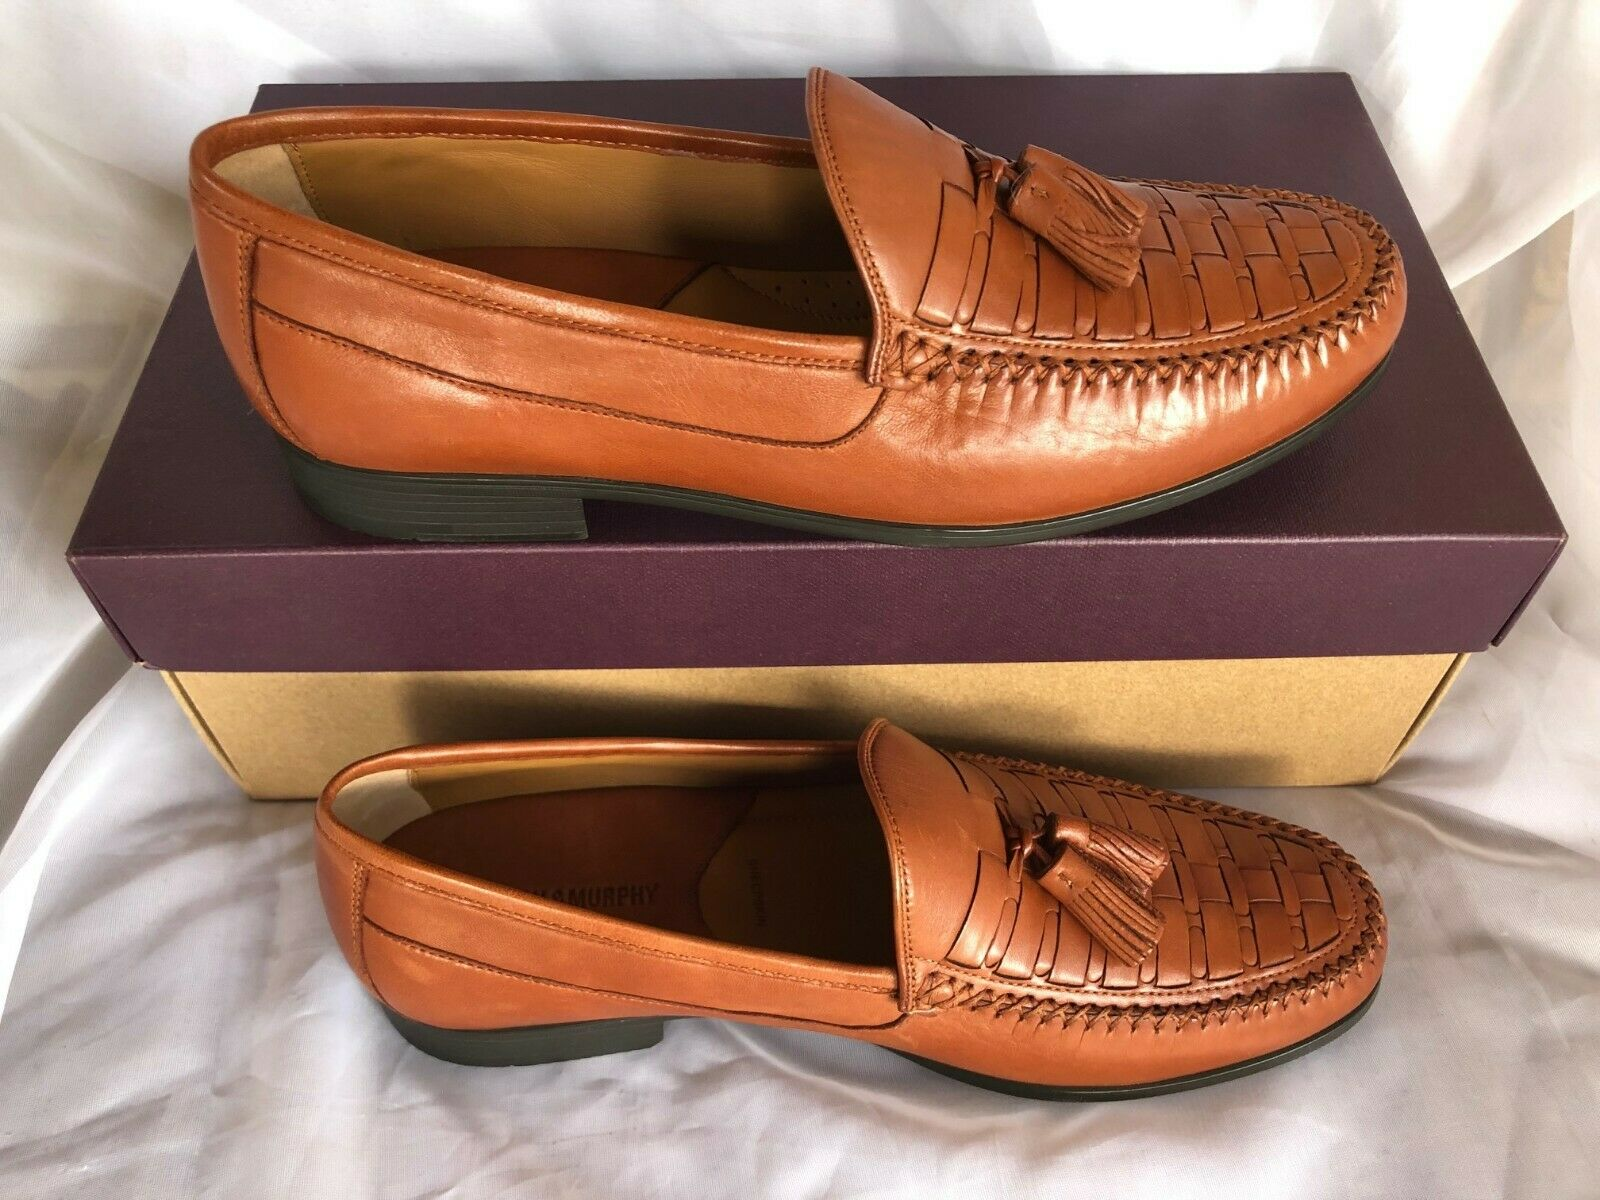 New Men's Johnston & Murphy Cresswell Woven Tassel Loafer Leather Cognac 11M 12M